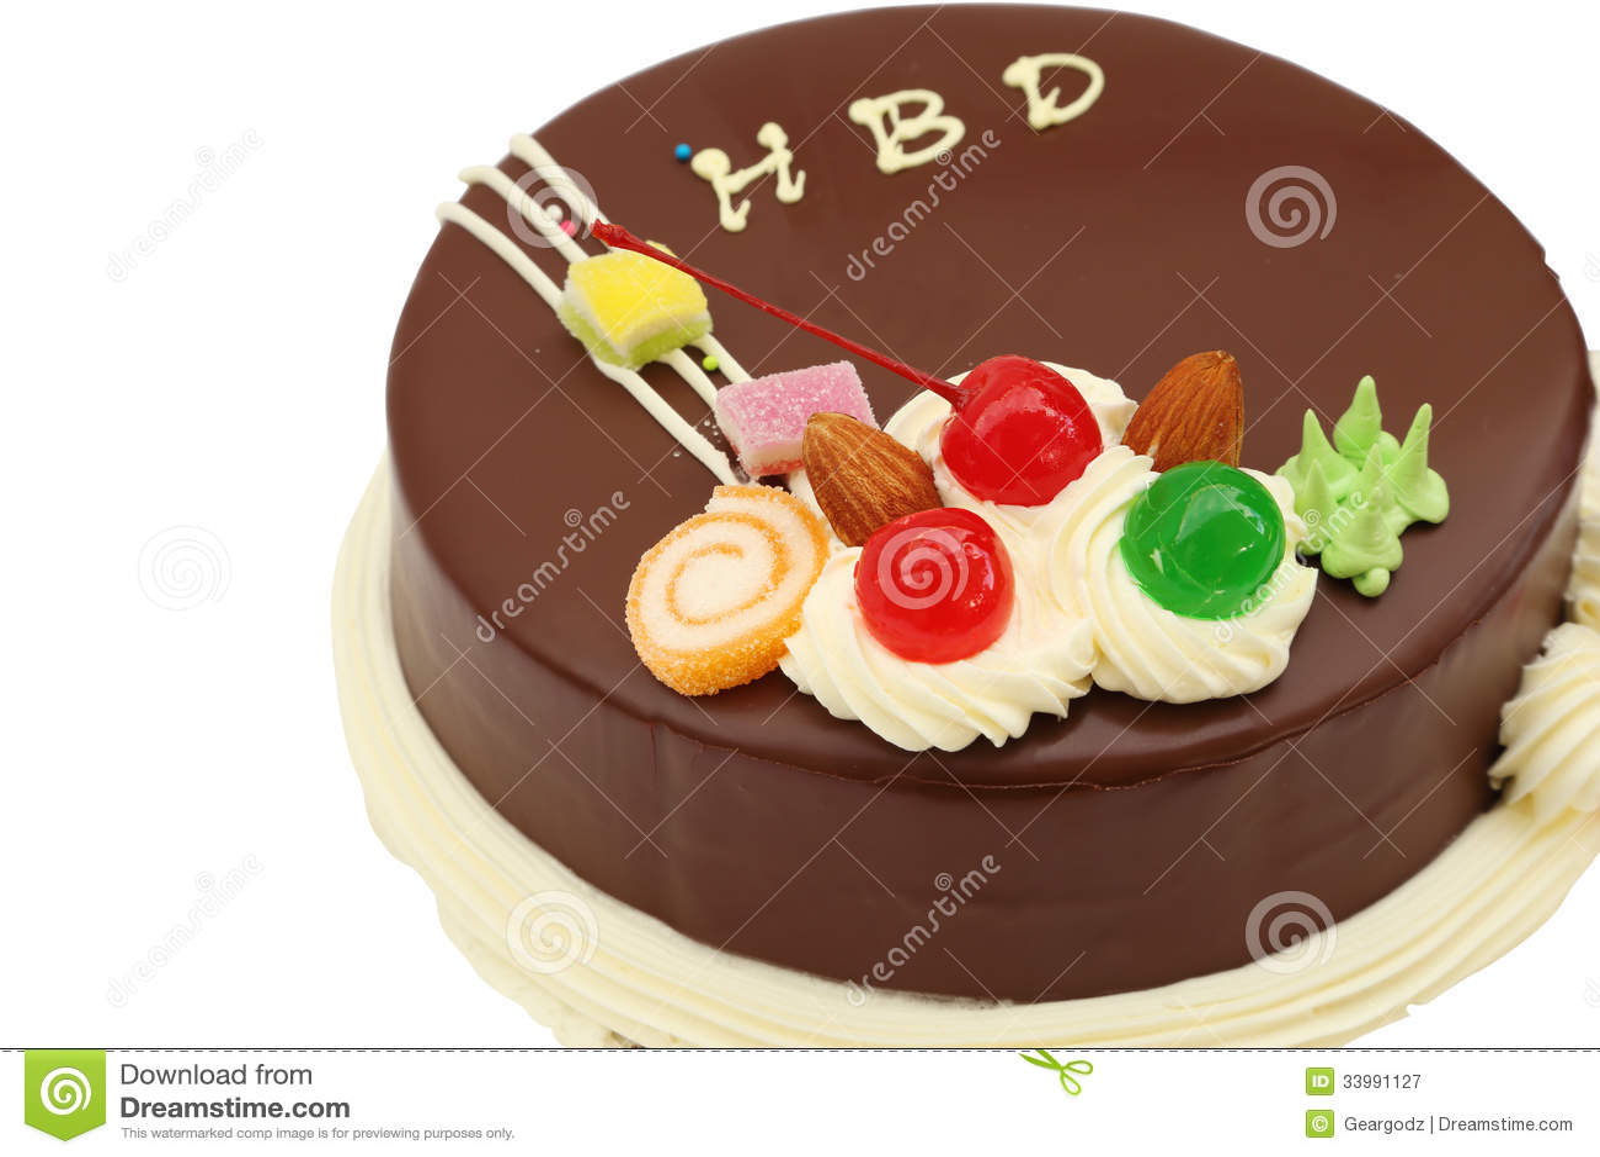 Happy Birthday Chocolate Cake On White Stock Image Image Of